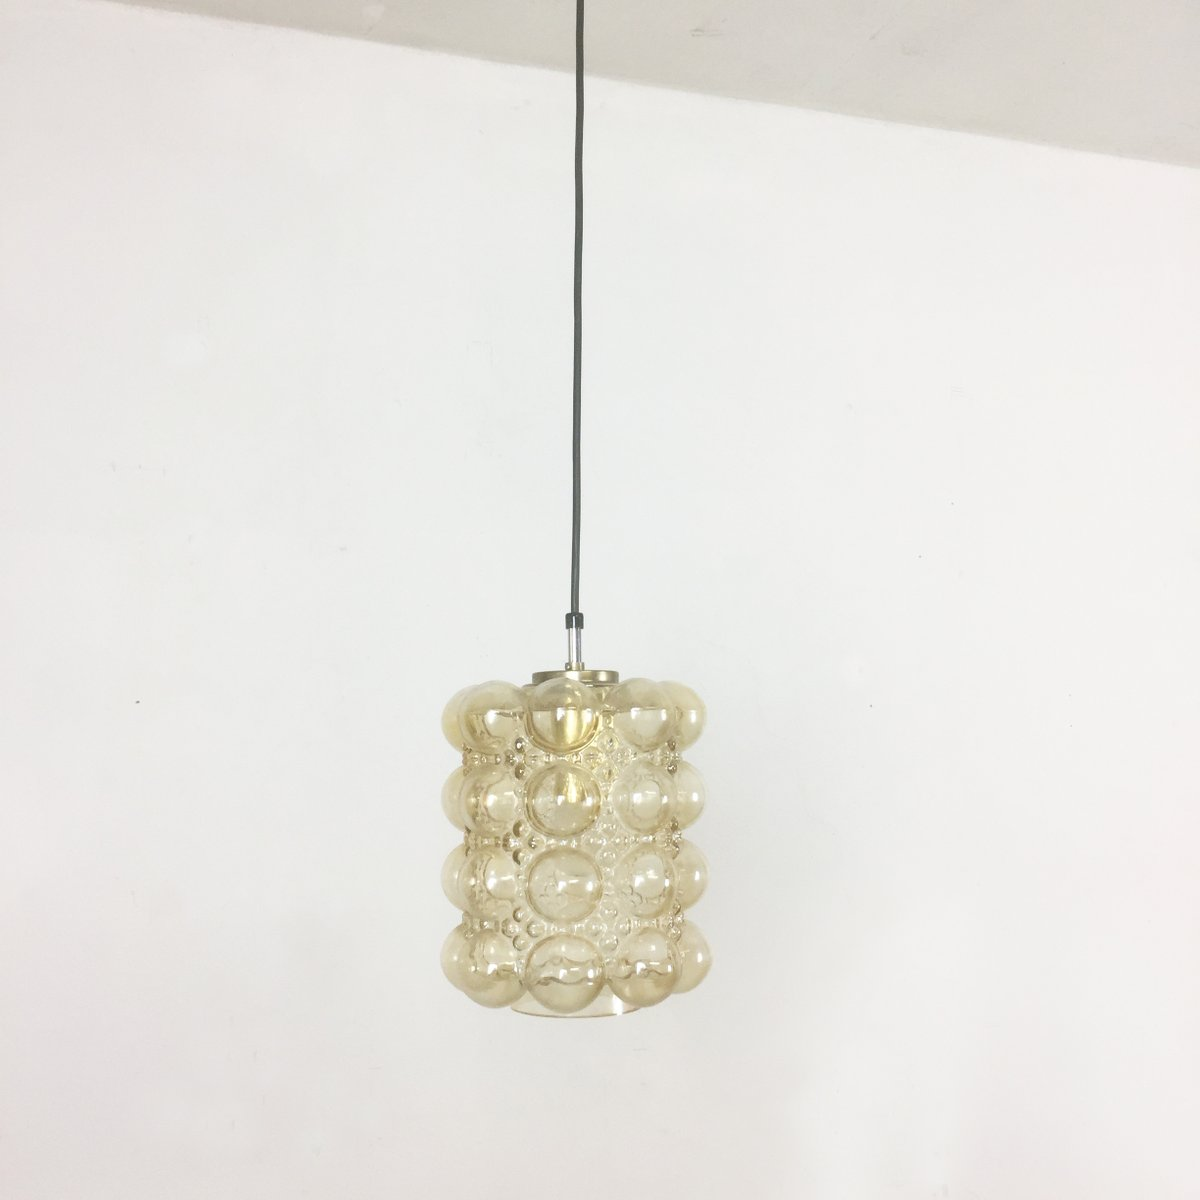 Modernist glass bubble ceiling light by helena tynell for glashtte modernist glass bubble ceiling light by helena tynell for glashtte limburg 1960s aloadofball Choice Image